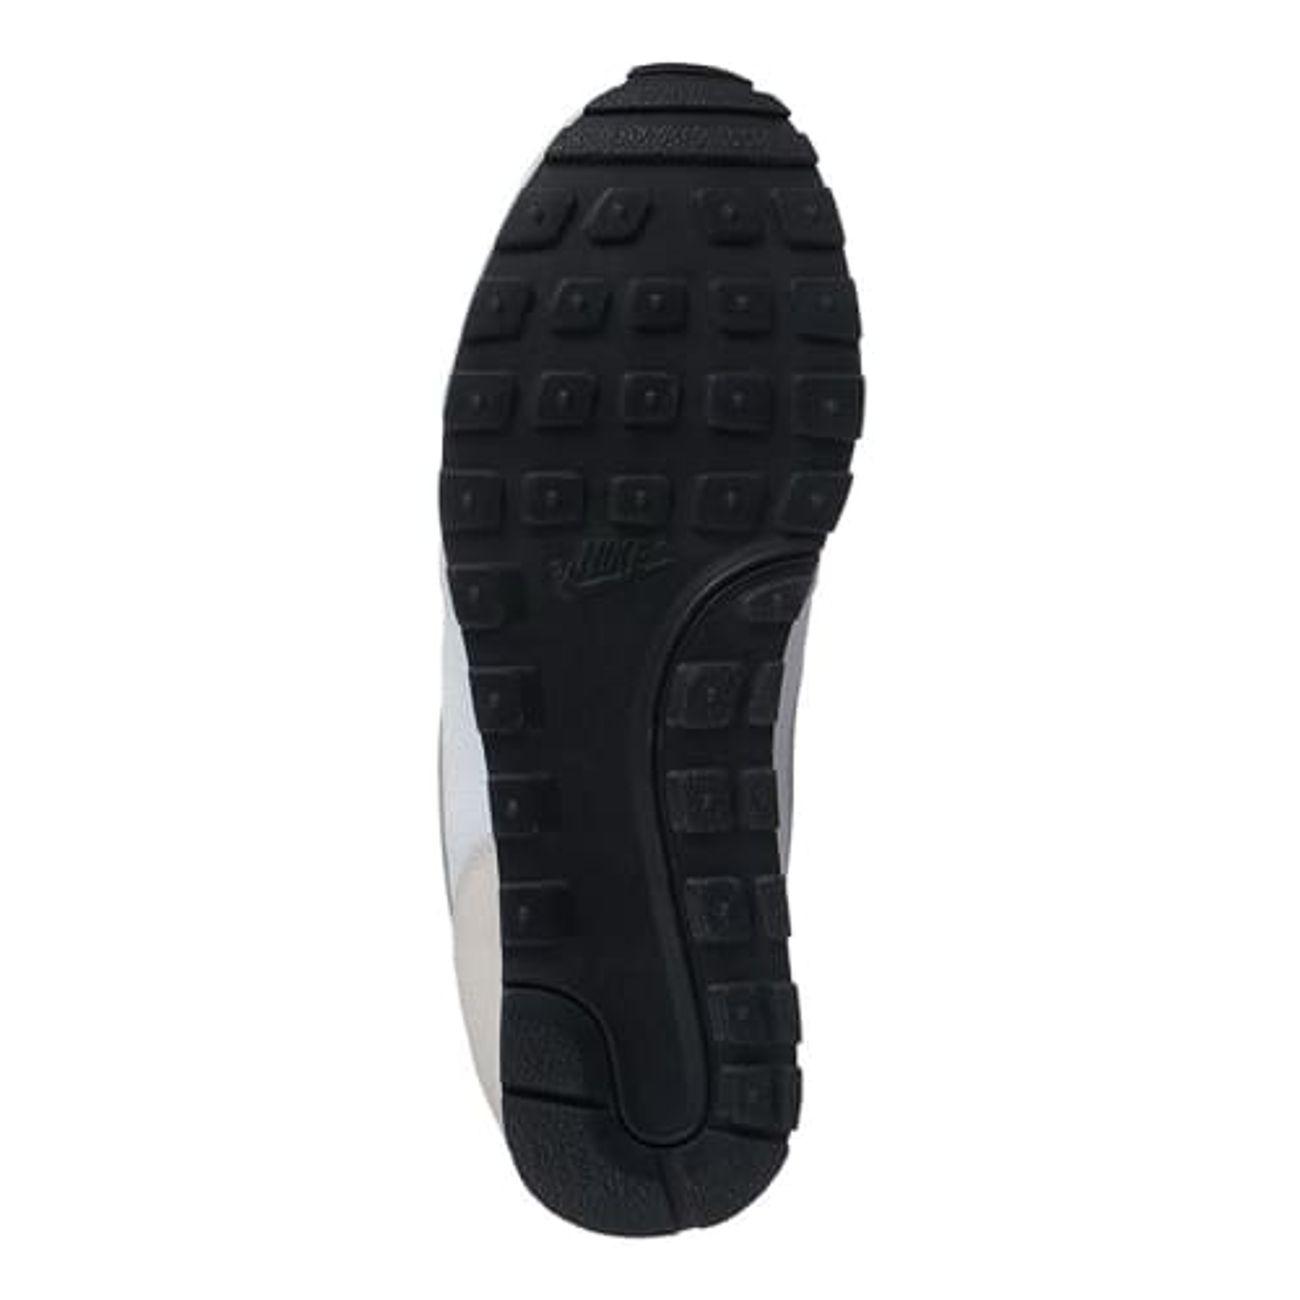 Blanc Homme Gris Runner 2 Nike Md Argenté Chaussures mvwyN0P8nO